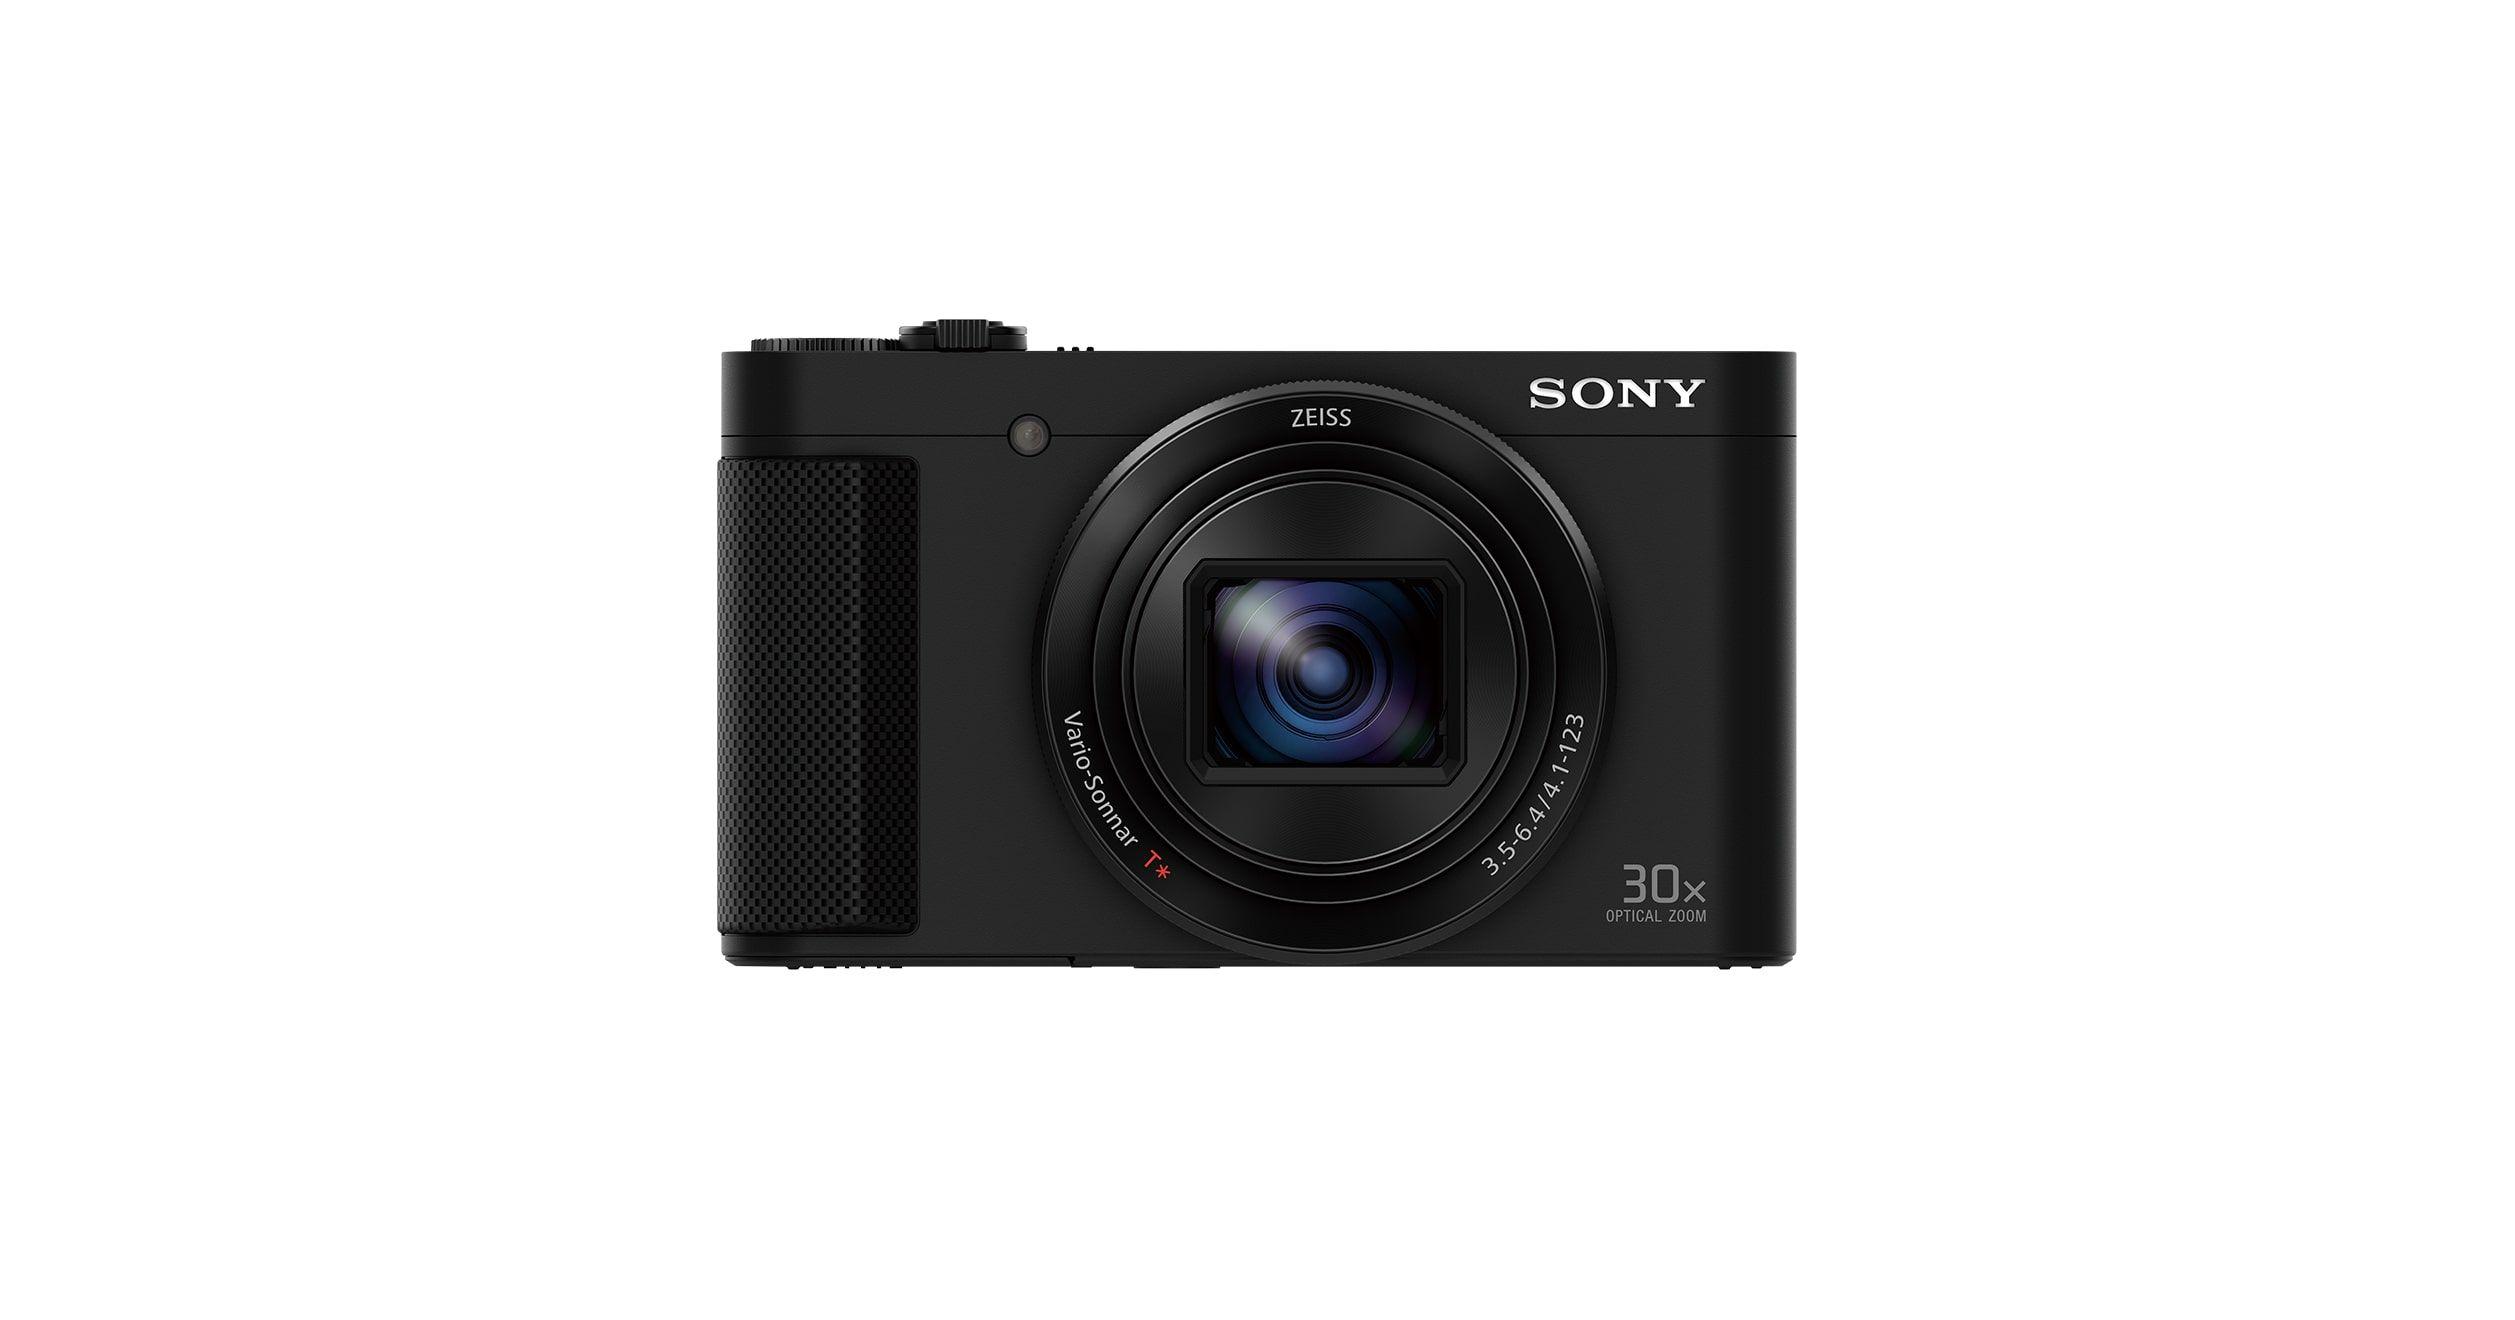 Hx90v Compact Camera With 30x Optical Zoom Sony Cybershot Compact Digital Camera Vlogging Camera